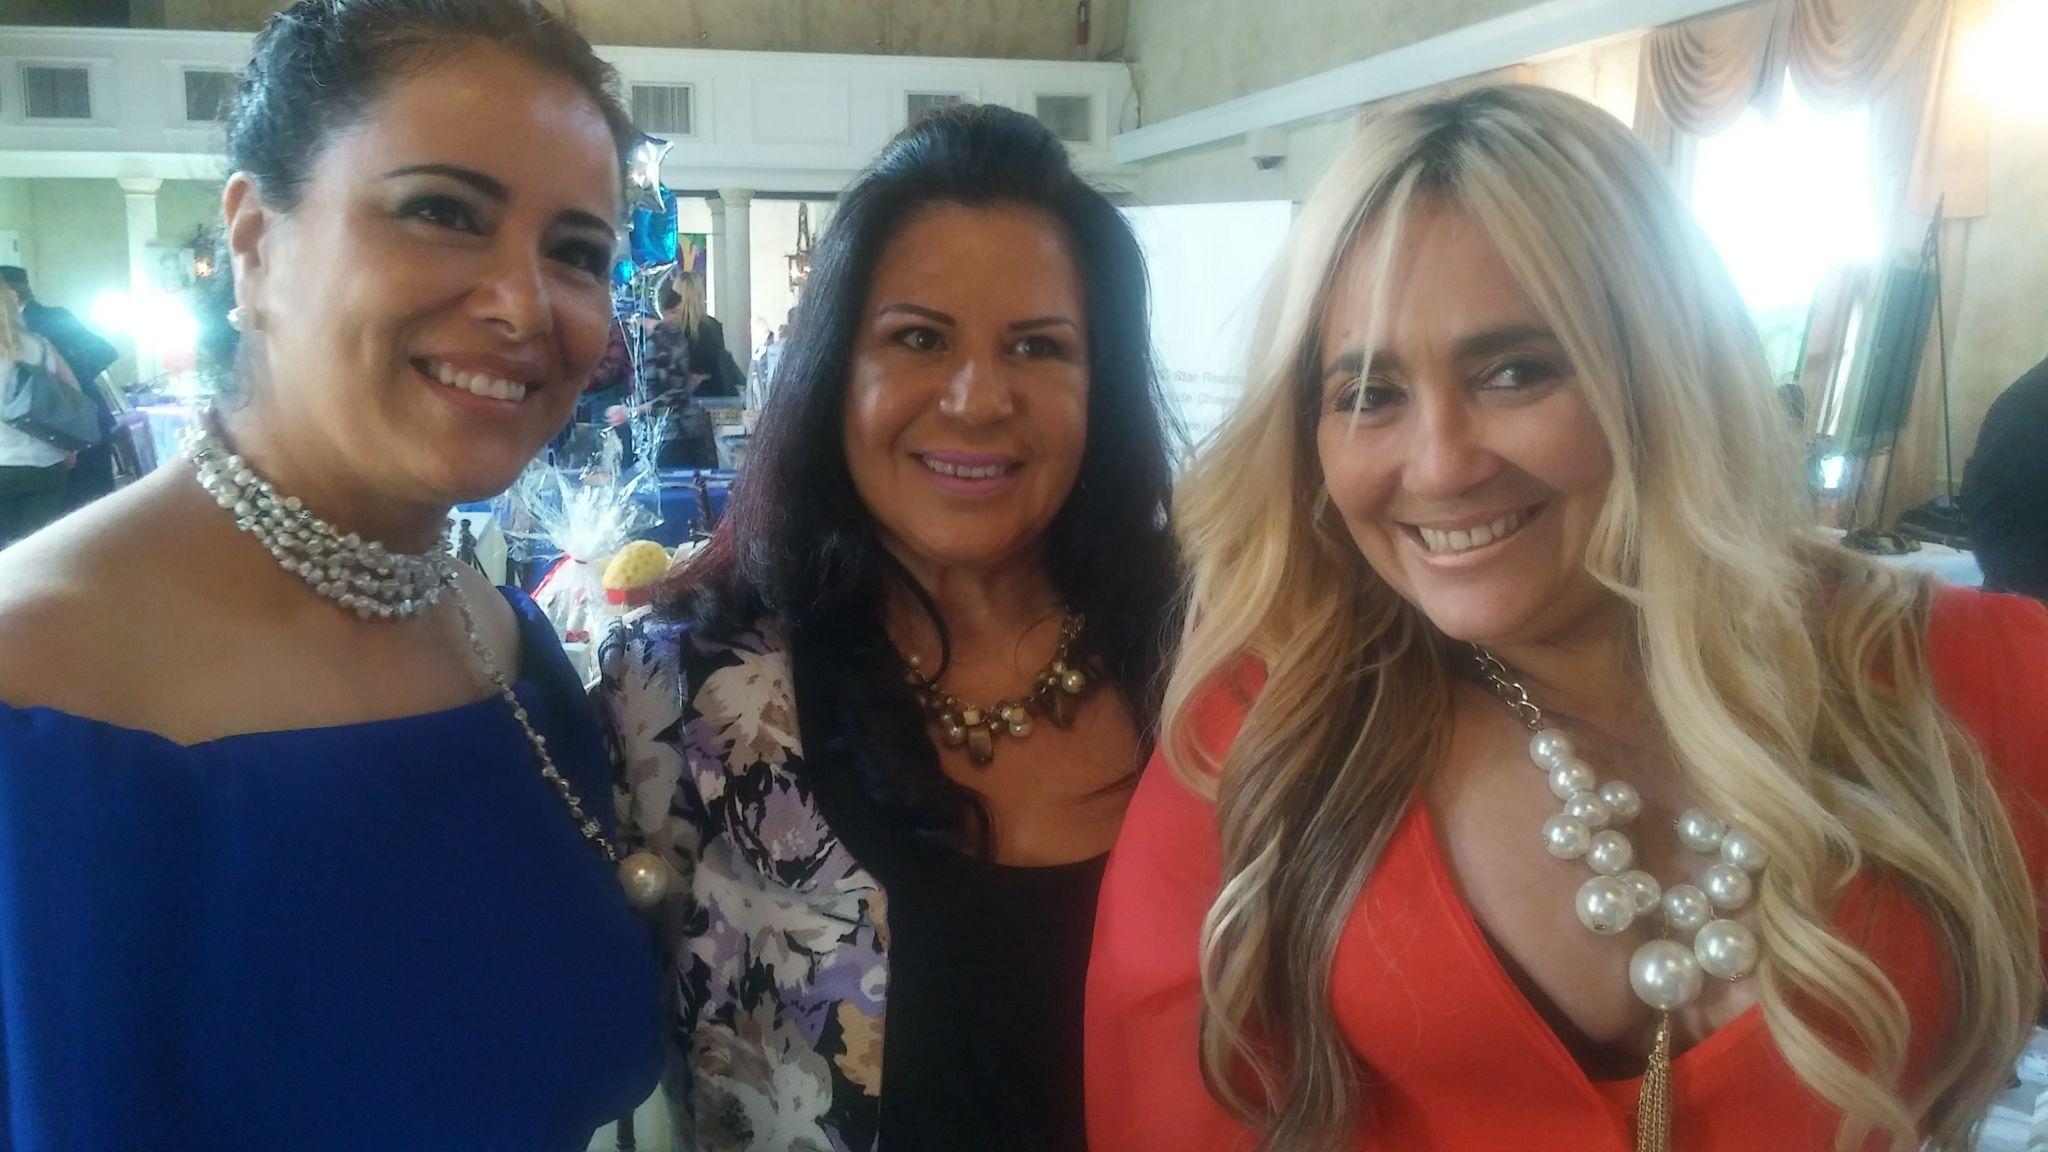 Mariso Casola, propietaria de la prestigiosa peluqueria La_Per, la maquilladora Mercedes Medina y Gloria Clavijo de Monir Fashion.